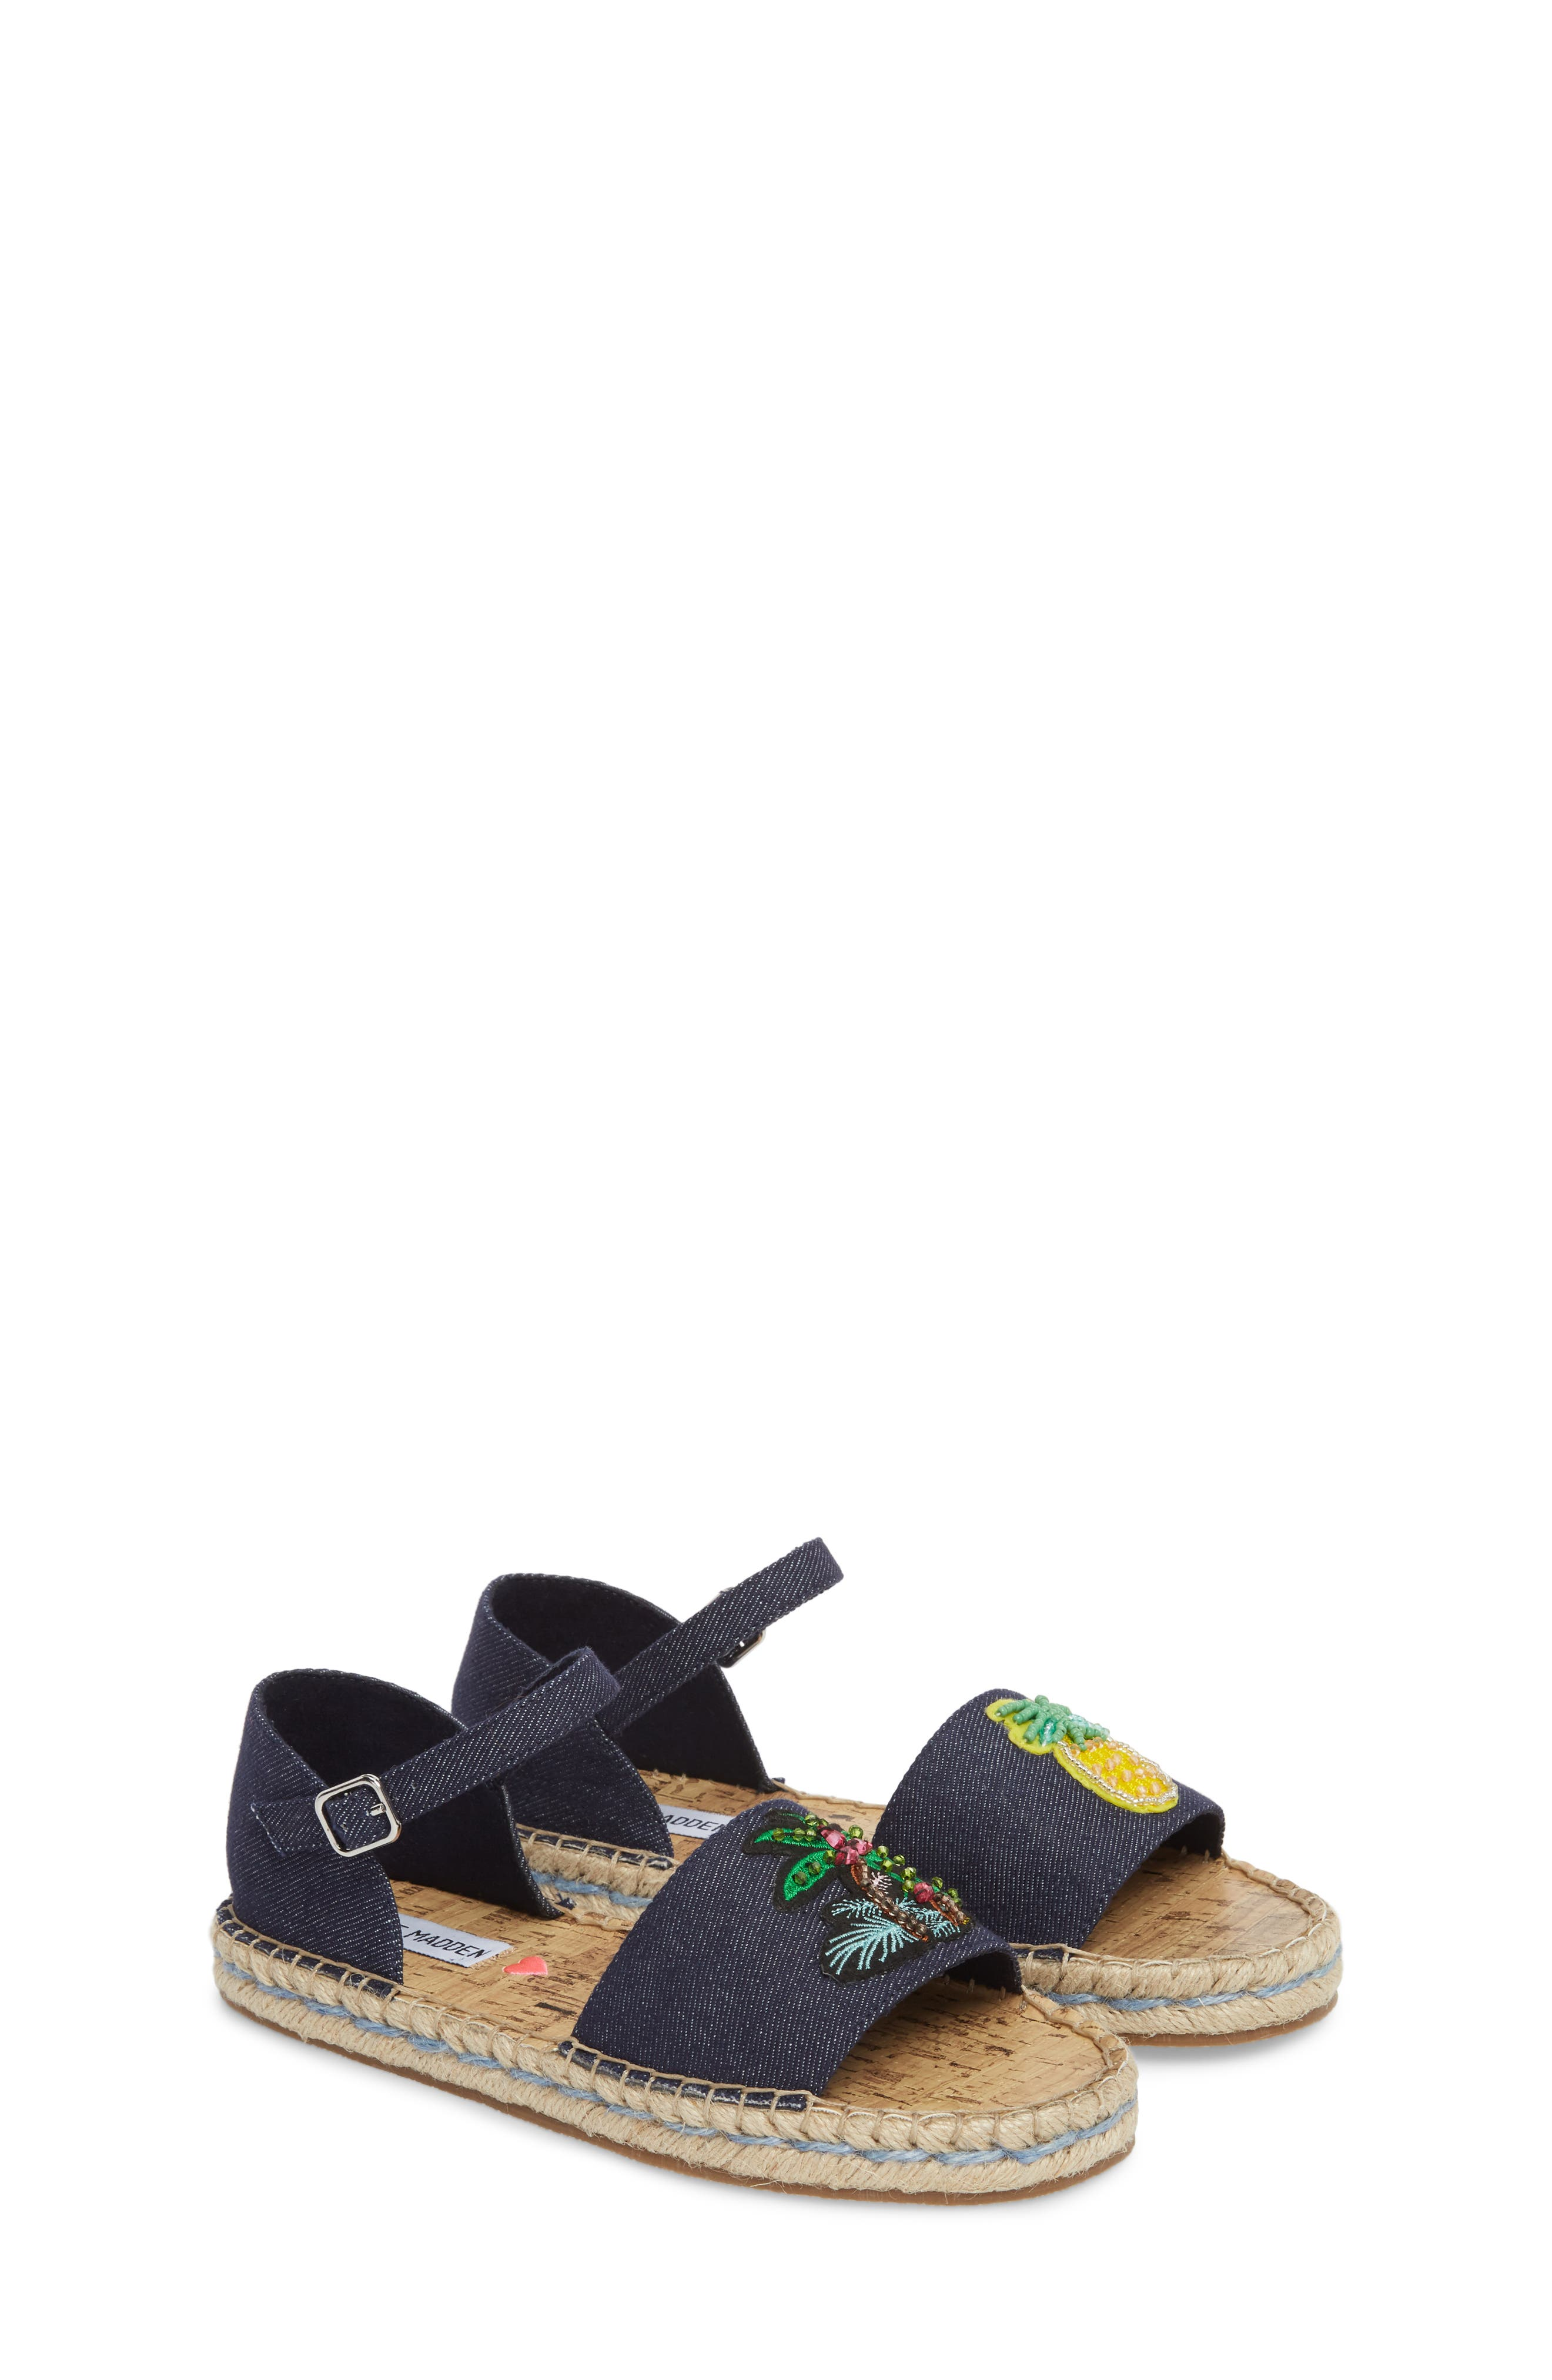 JLUAO Tropical Embellished Sandal,                             Alternate thumbnail 2, color,                             001